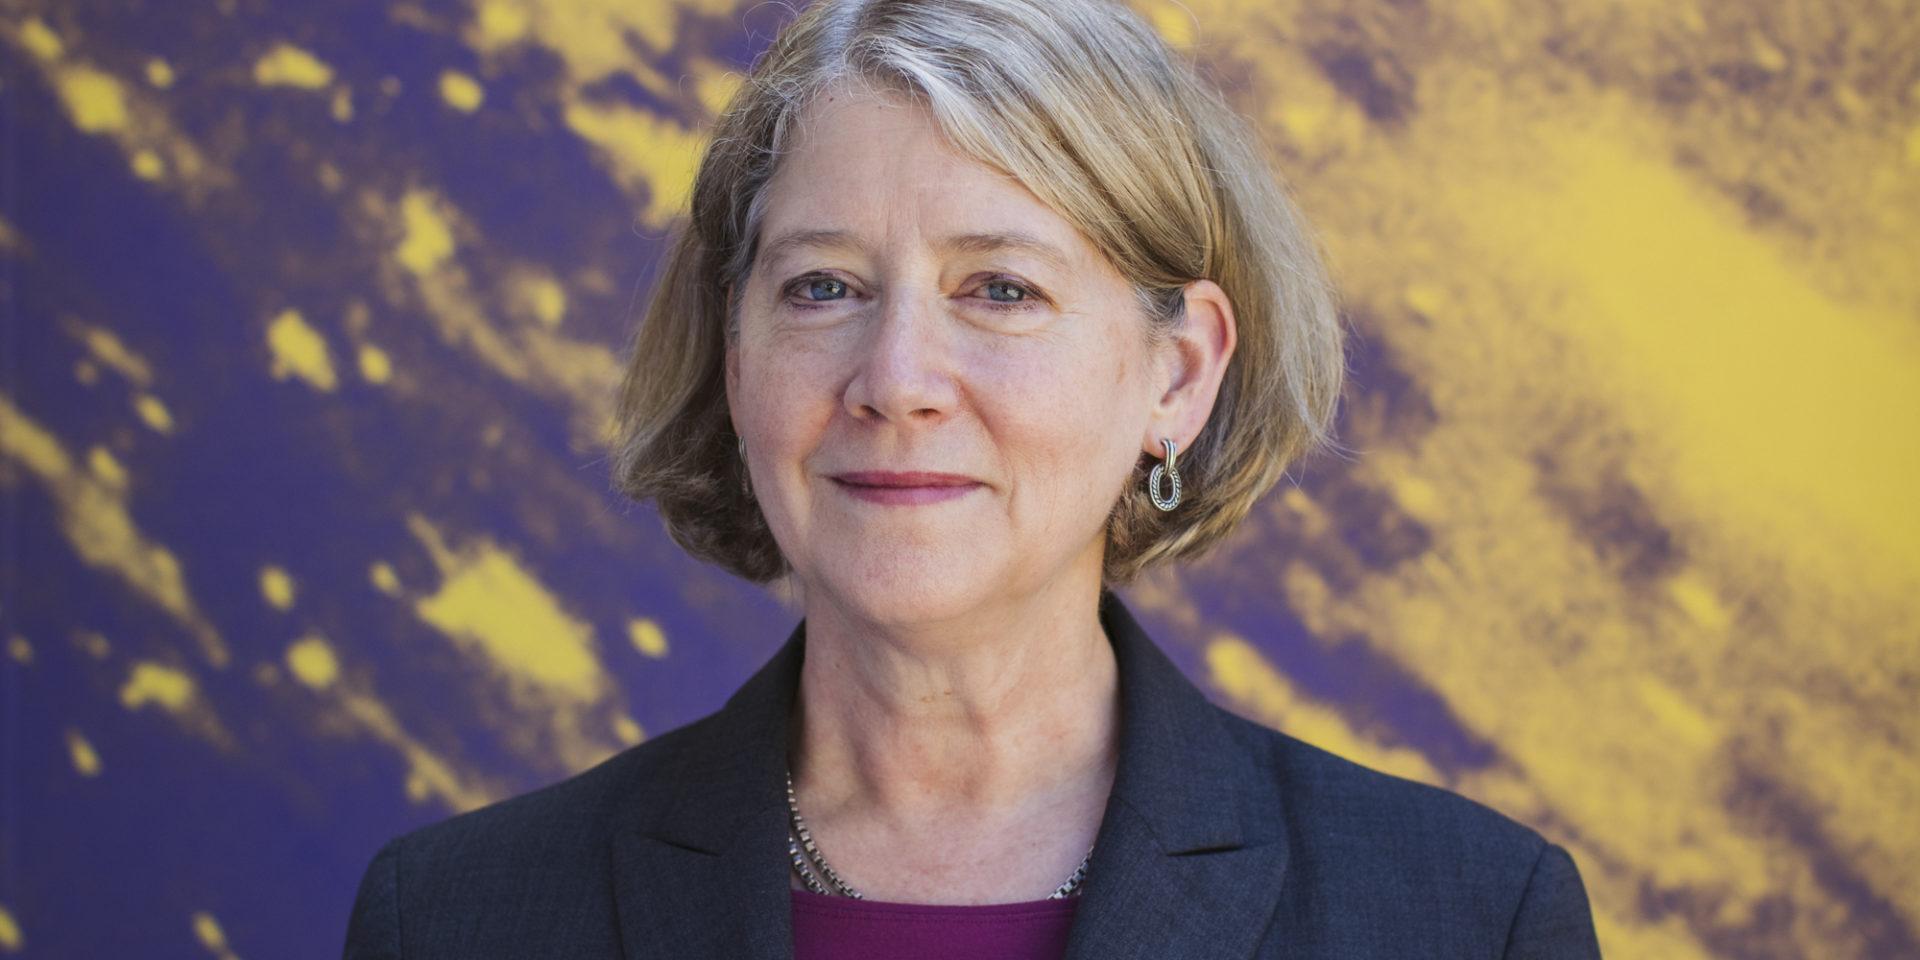 AAS Congratulates Col. Pam Melroy on Confirmation as NASA Deputy Administrator